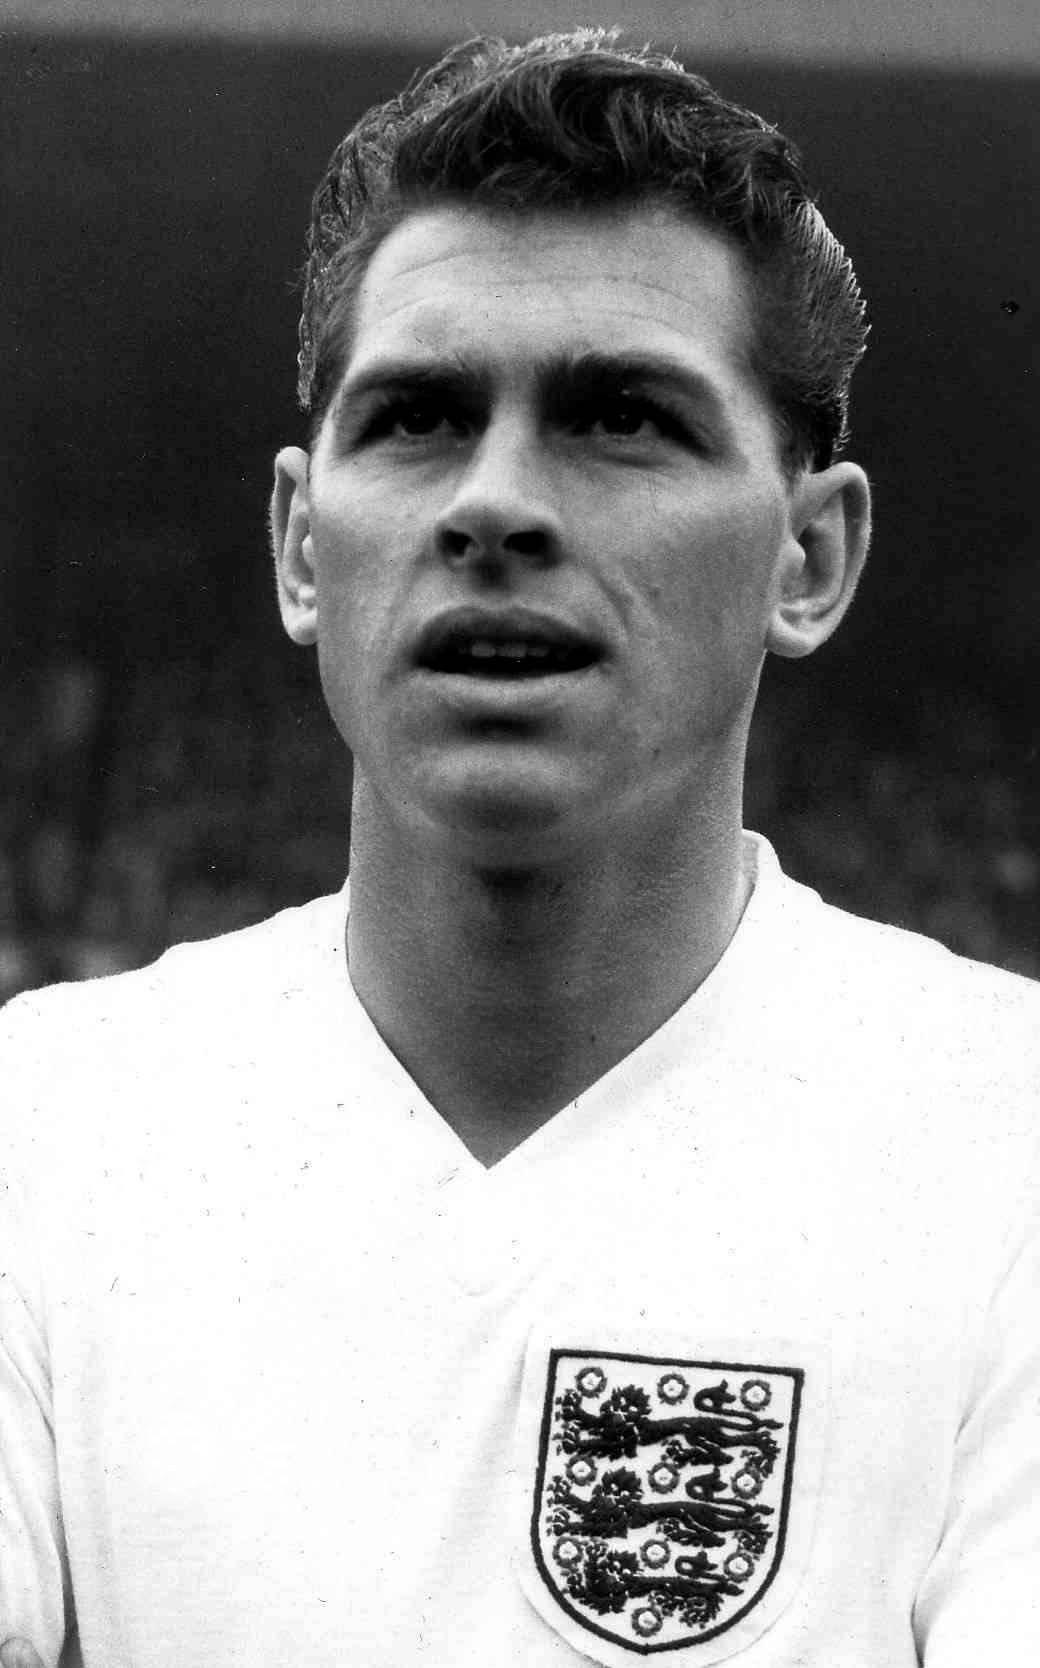 English footballer Brian Clough 1935 2004 during his time as a